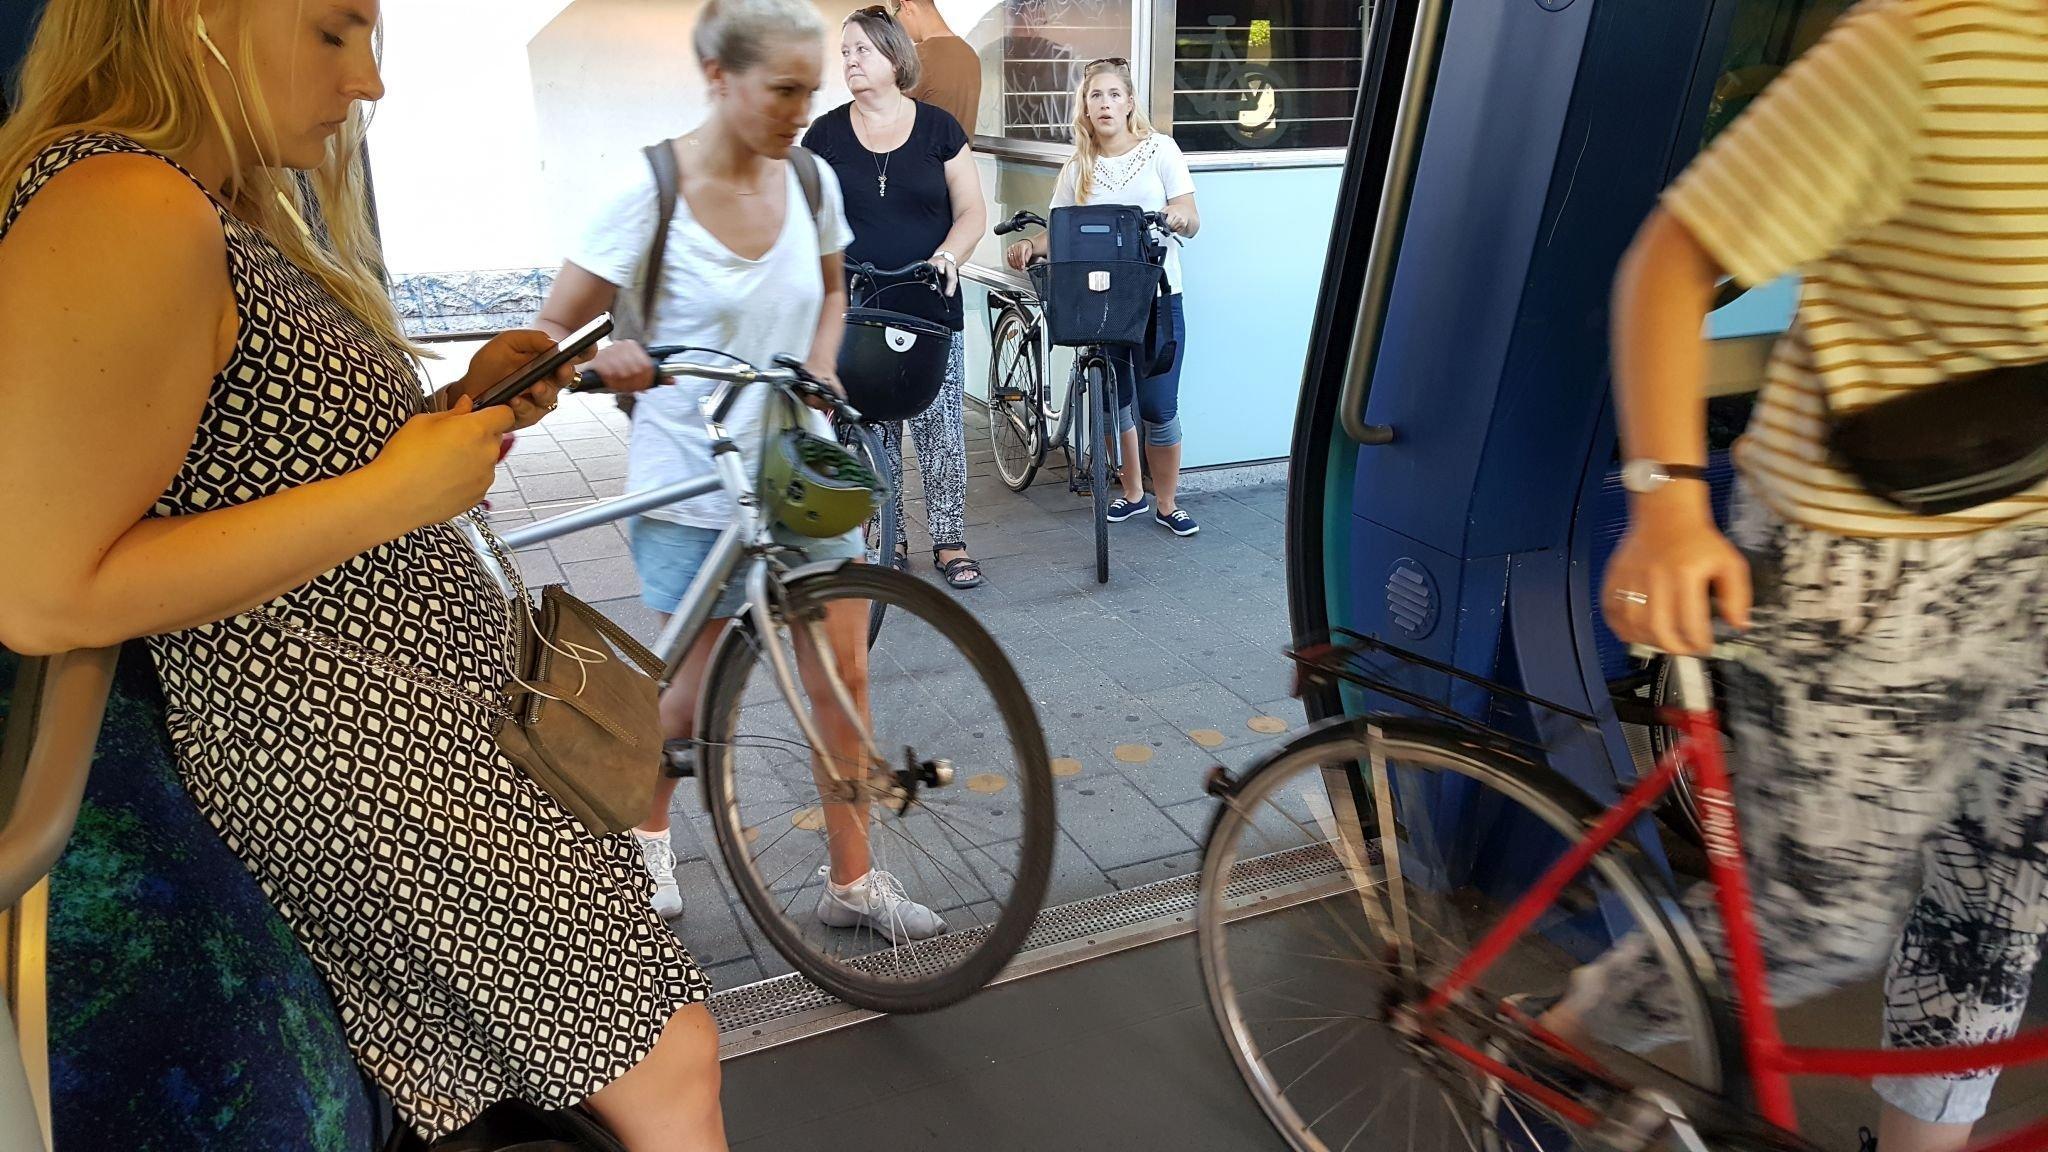 Radlerin steigen mit Rad in S-Bahn in Kopenhagen.